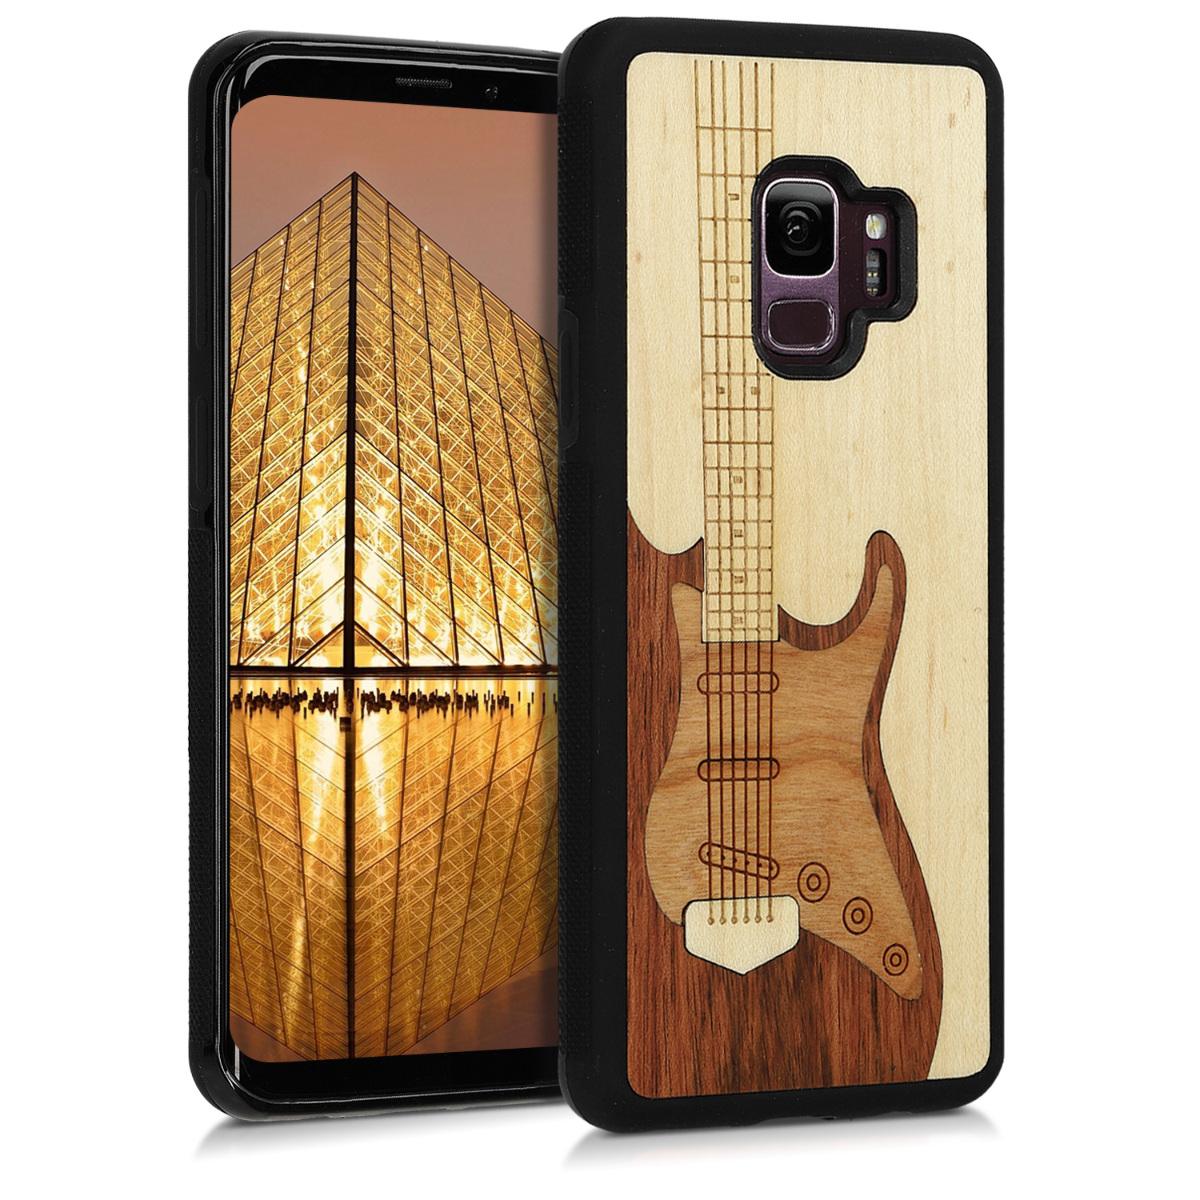 Dřevěné Pouzdro pro Samsung Galaxy S9 - TPU Bumper - Guitar inlaid wood Dark Brown / Brown / Light Brown